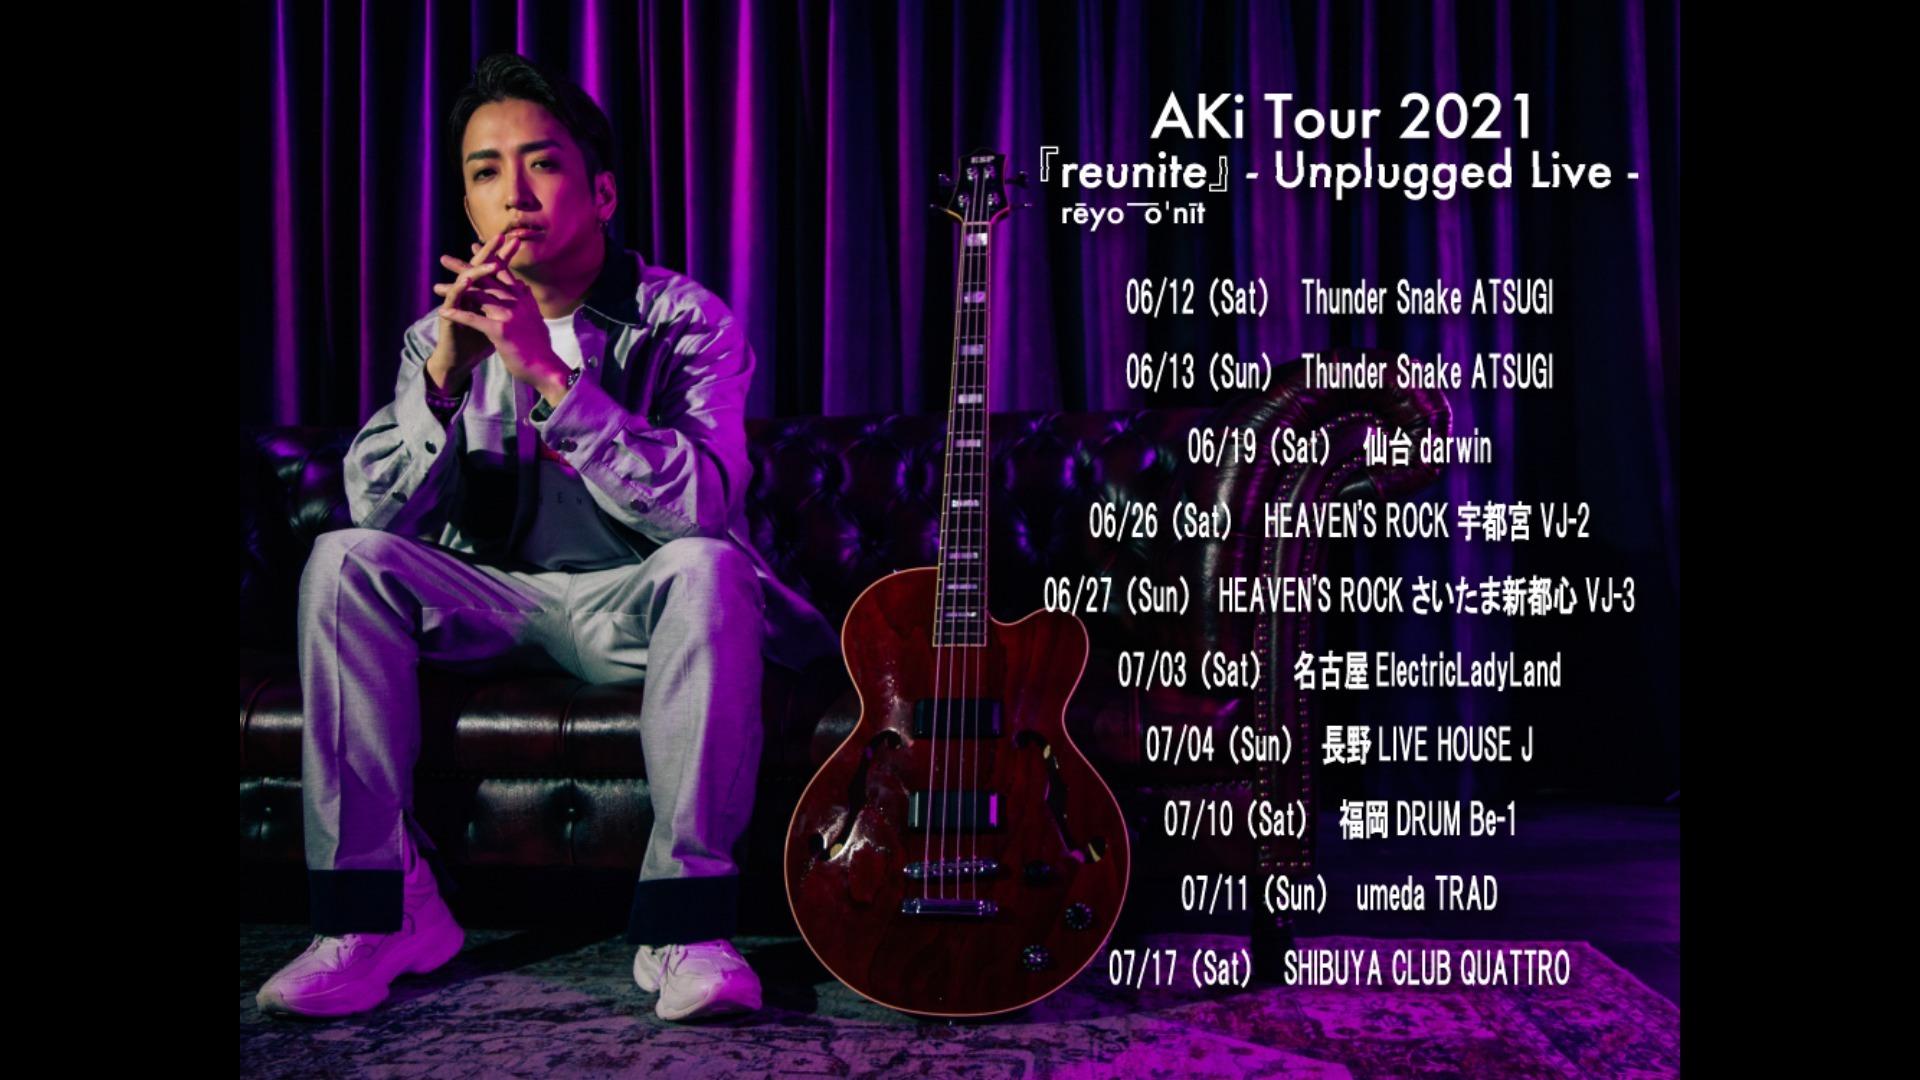 AKi Tour 2021 『reunite』 チケット再受付